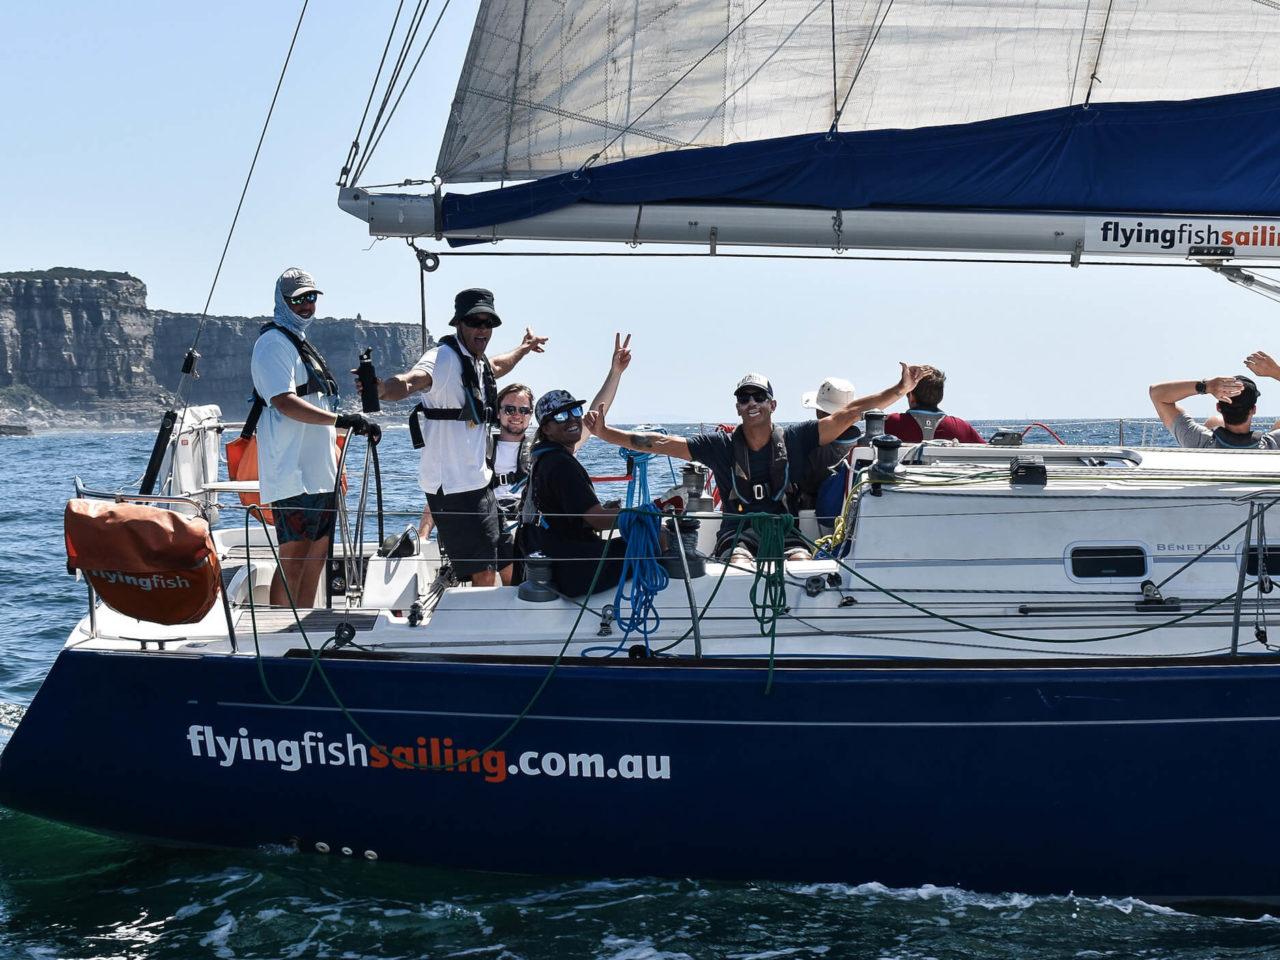 Flying-FIsh-Sailing--096